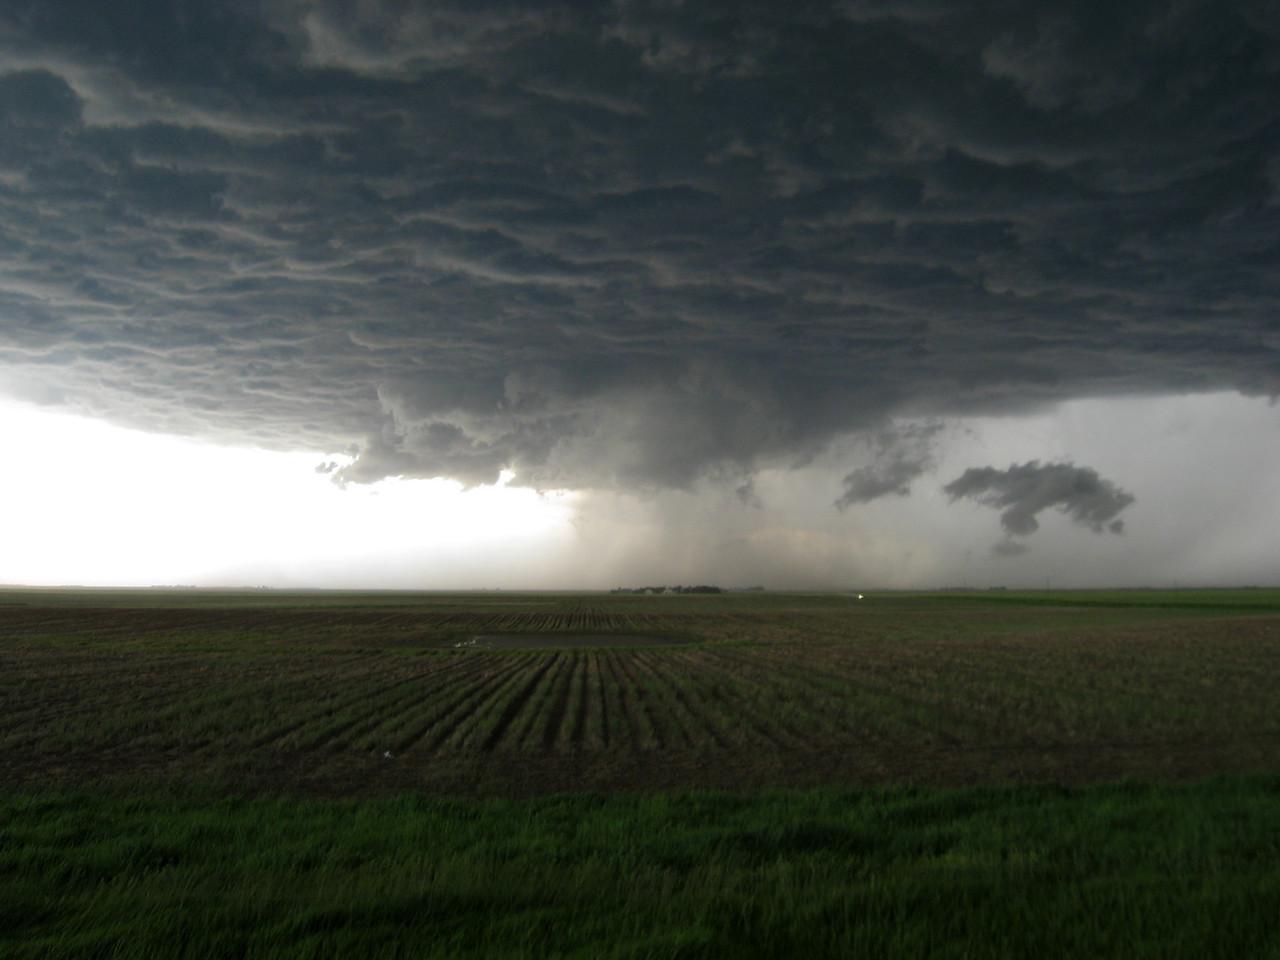 Tornadogenesis Failure